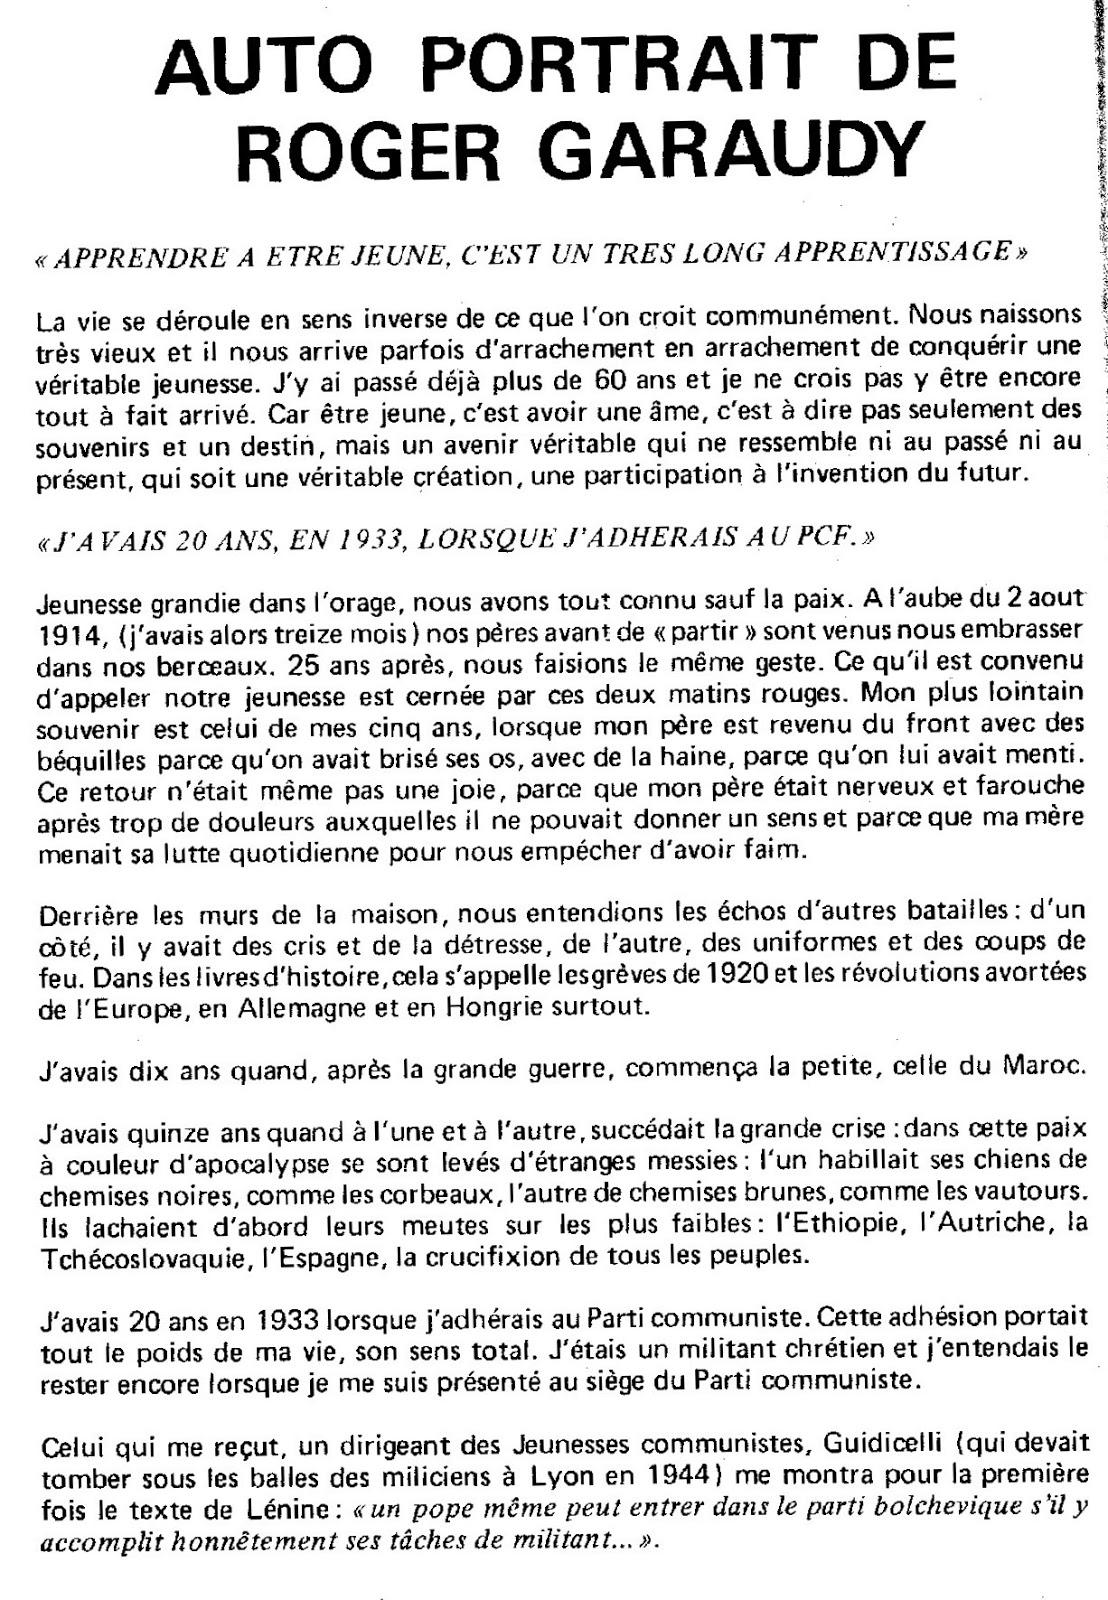 Roger Garaudy A Contre Nuit 2012